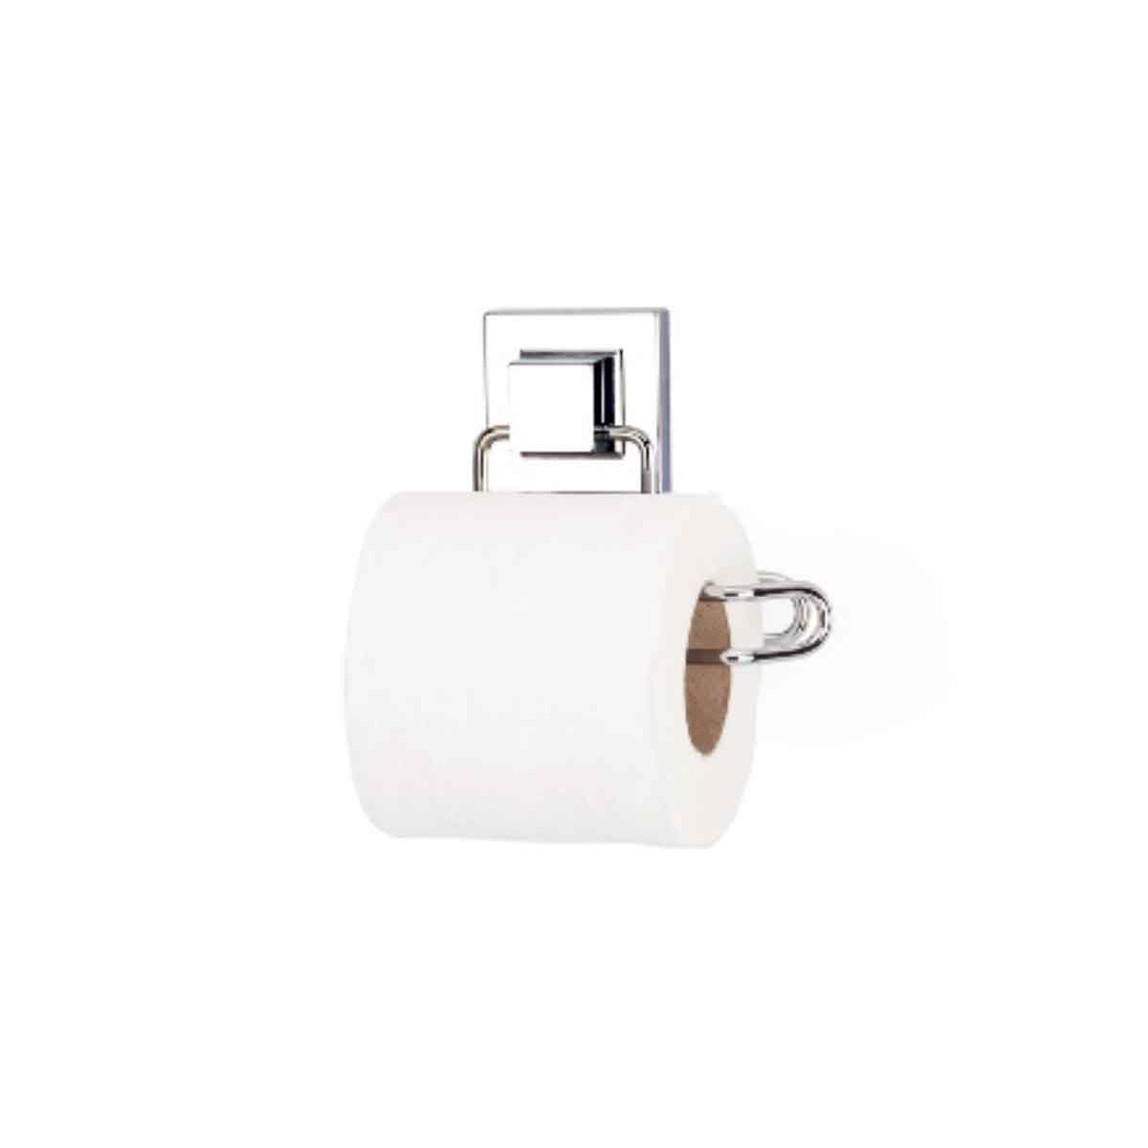 EasyFix Yapışkanlı Tuvalet Kağıtlığı